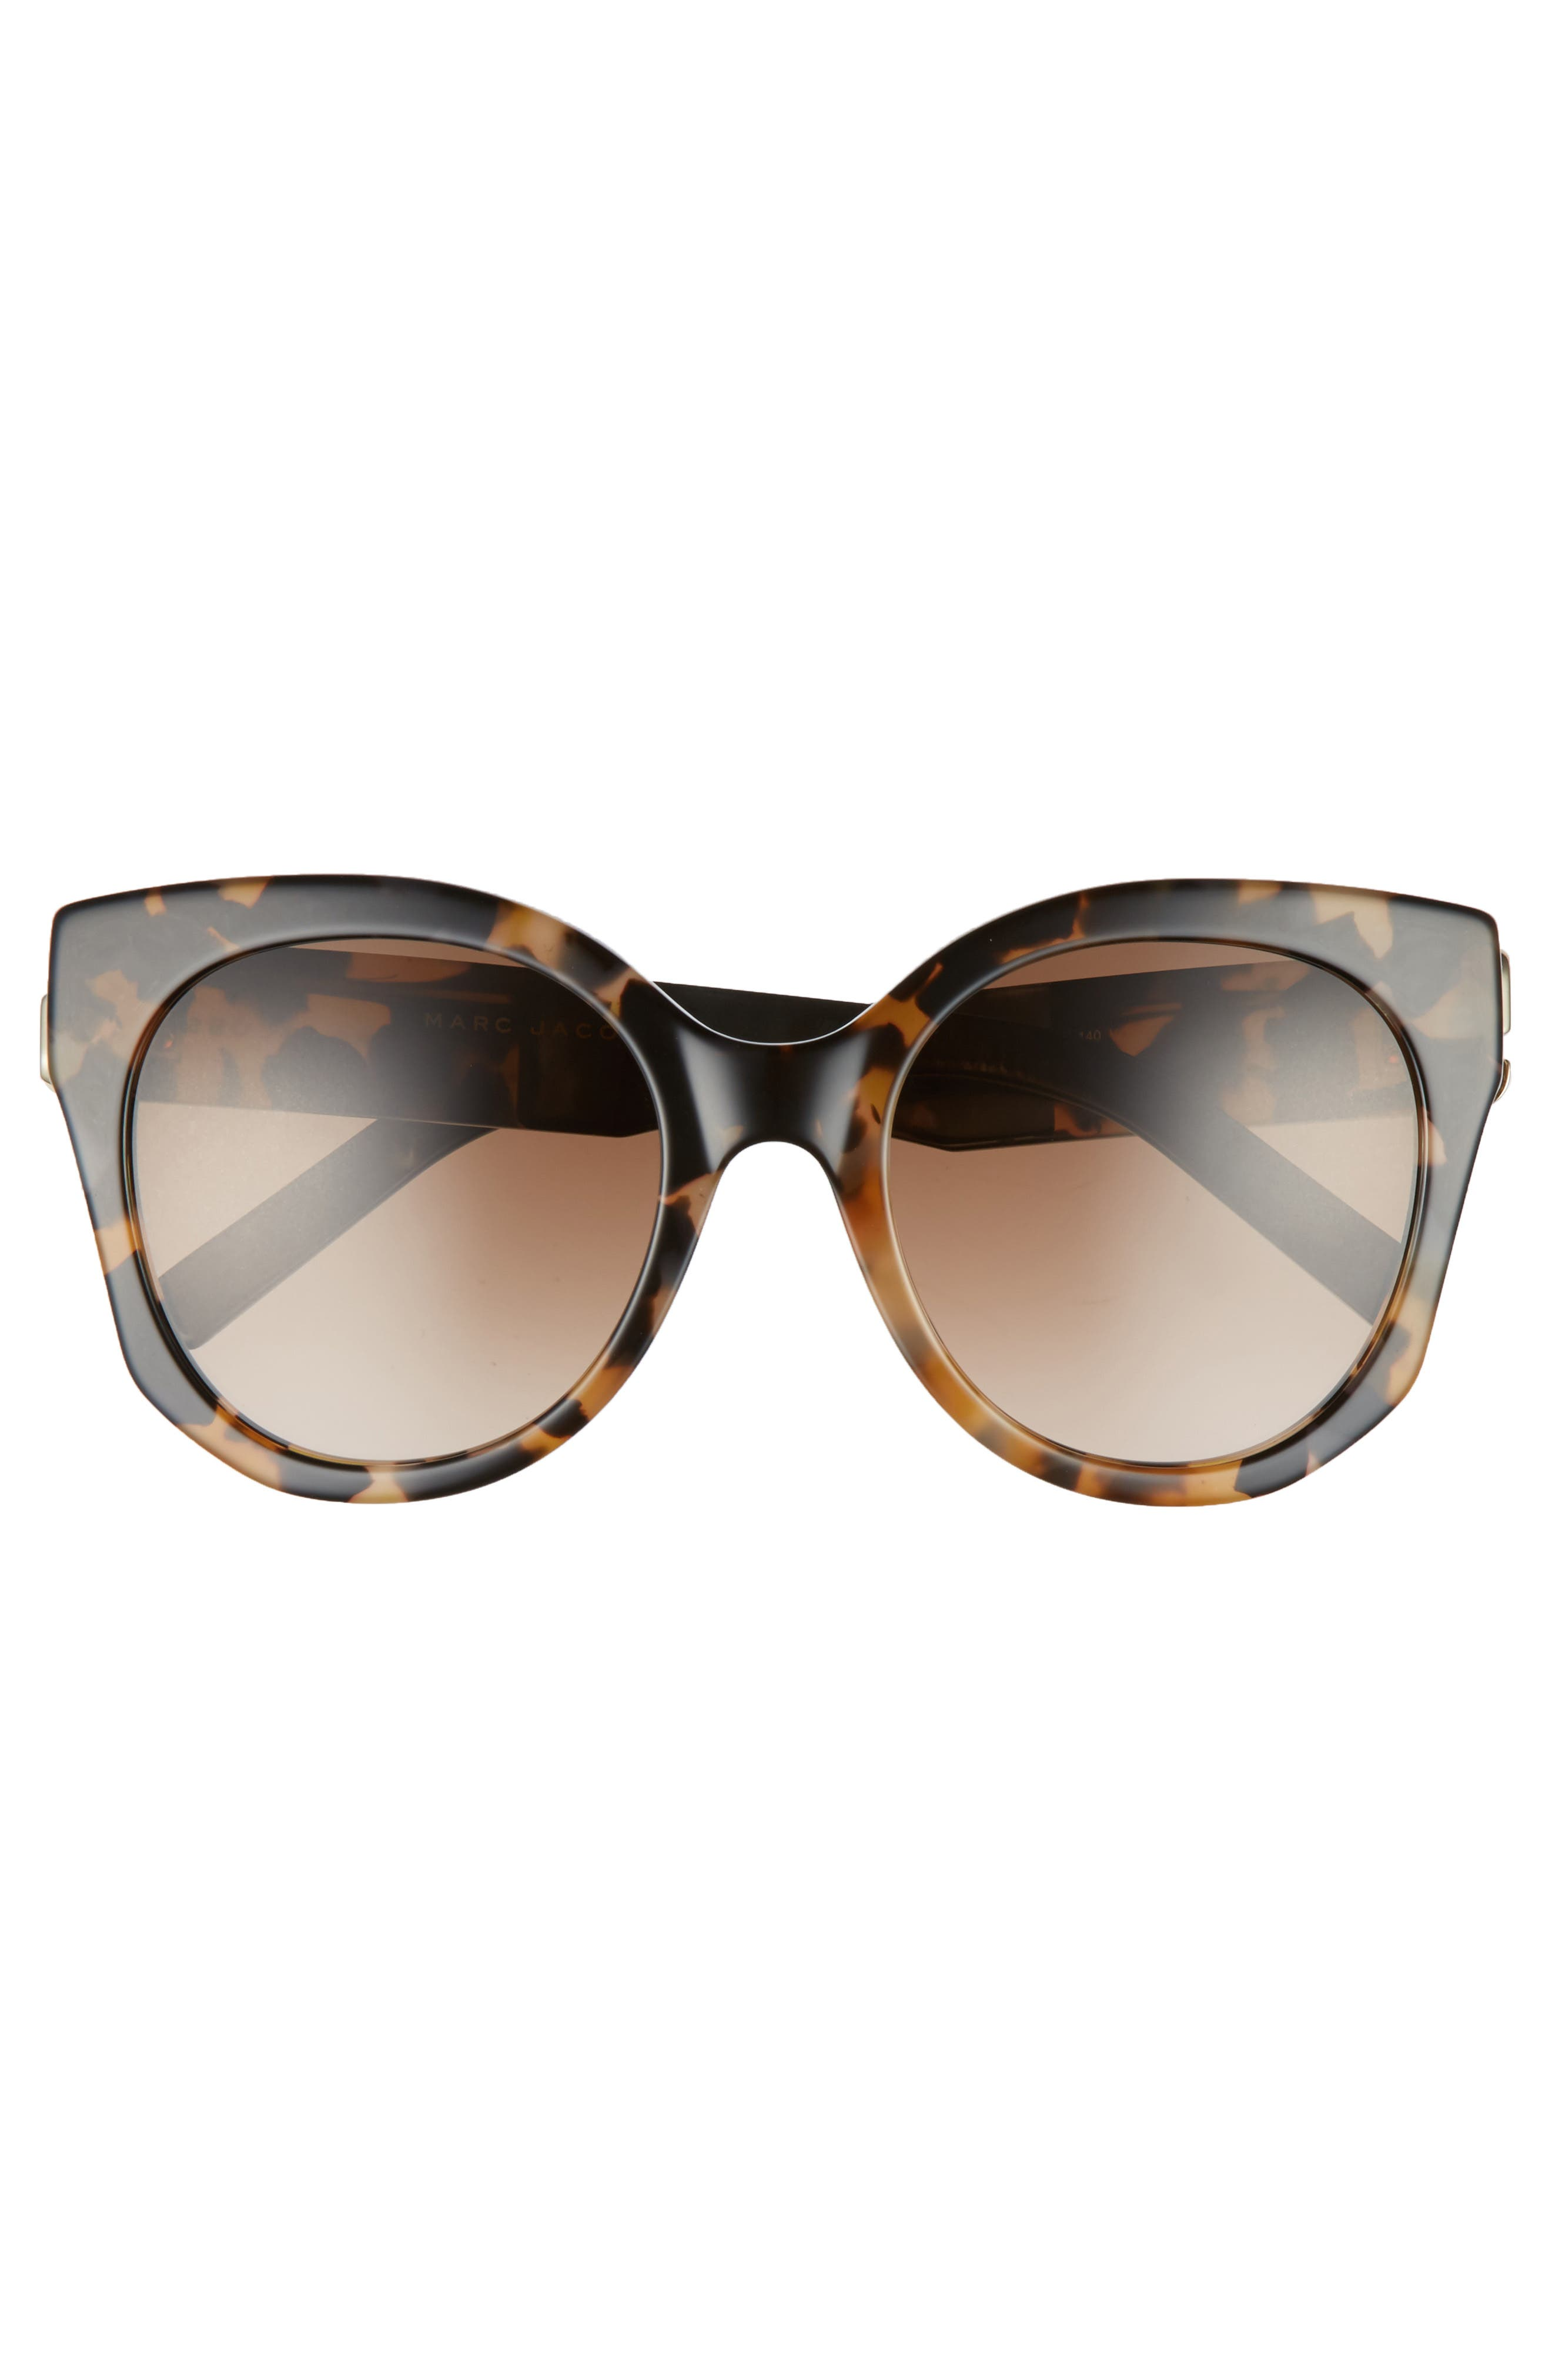 53mm Gradient Lens Cat Eye Sunglasses,                             Alternate thumbnail 3, color,                             Dark Havanna